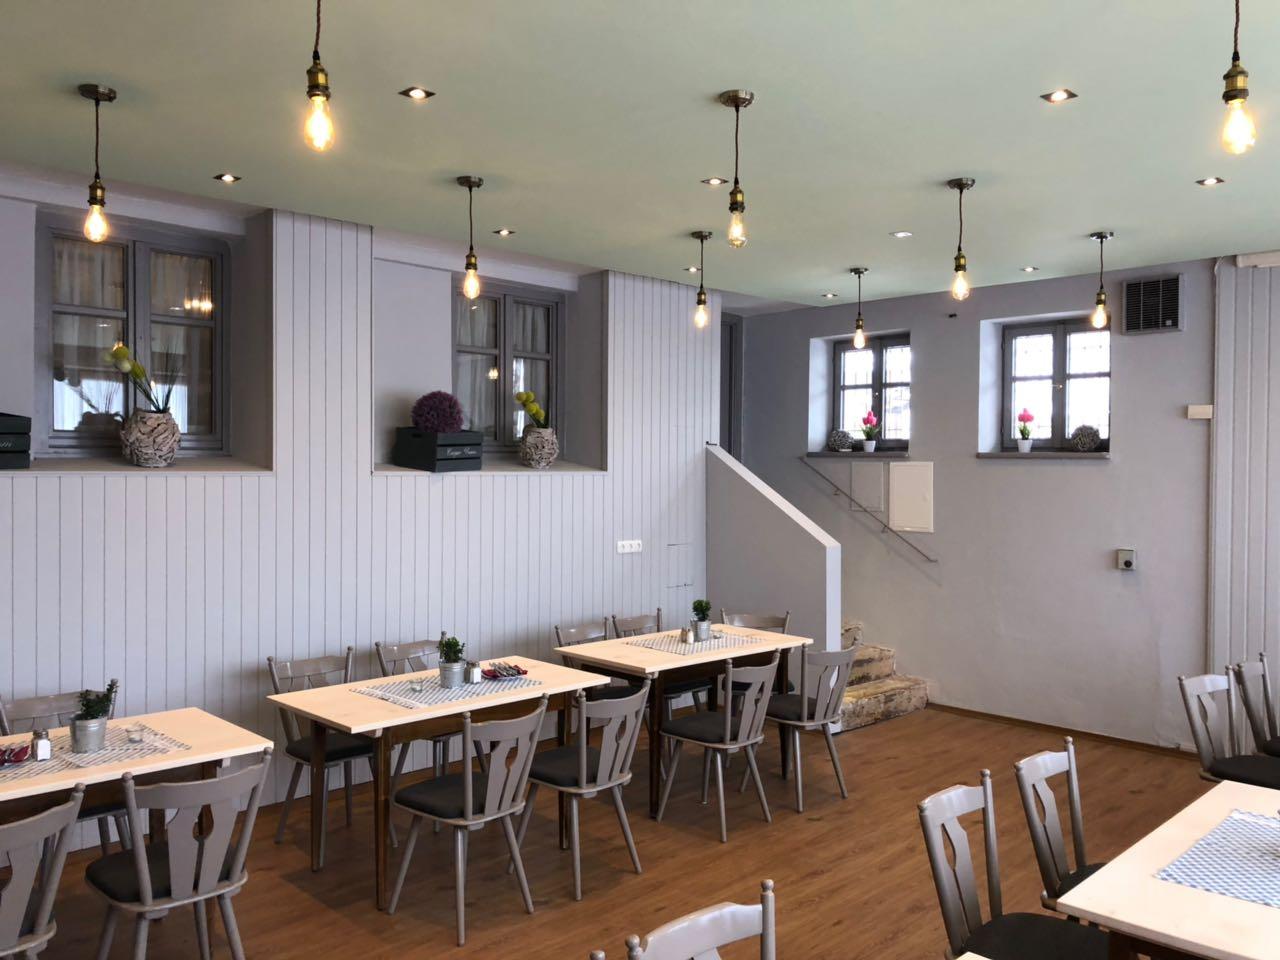 Maler Rosenheim Malermeister Hotel Umgestaltung